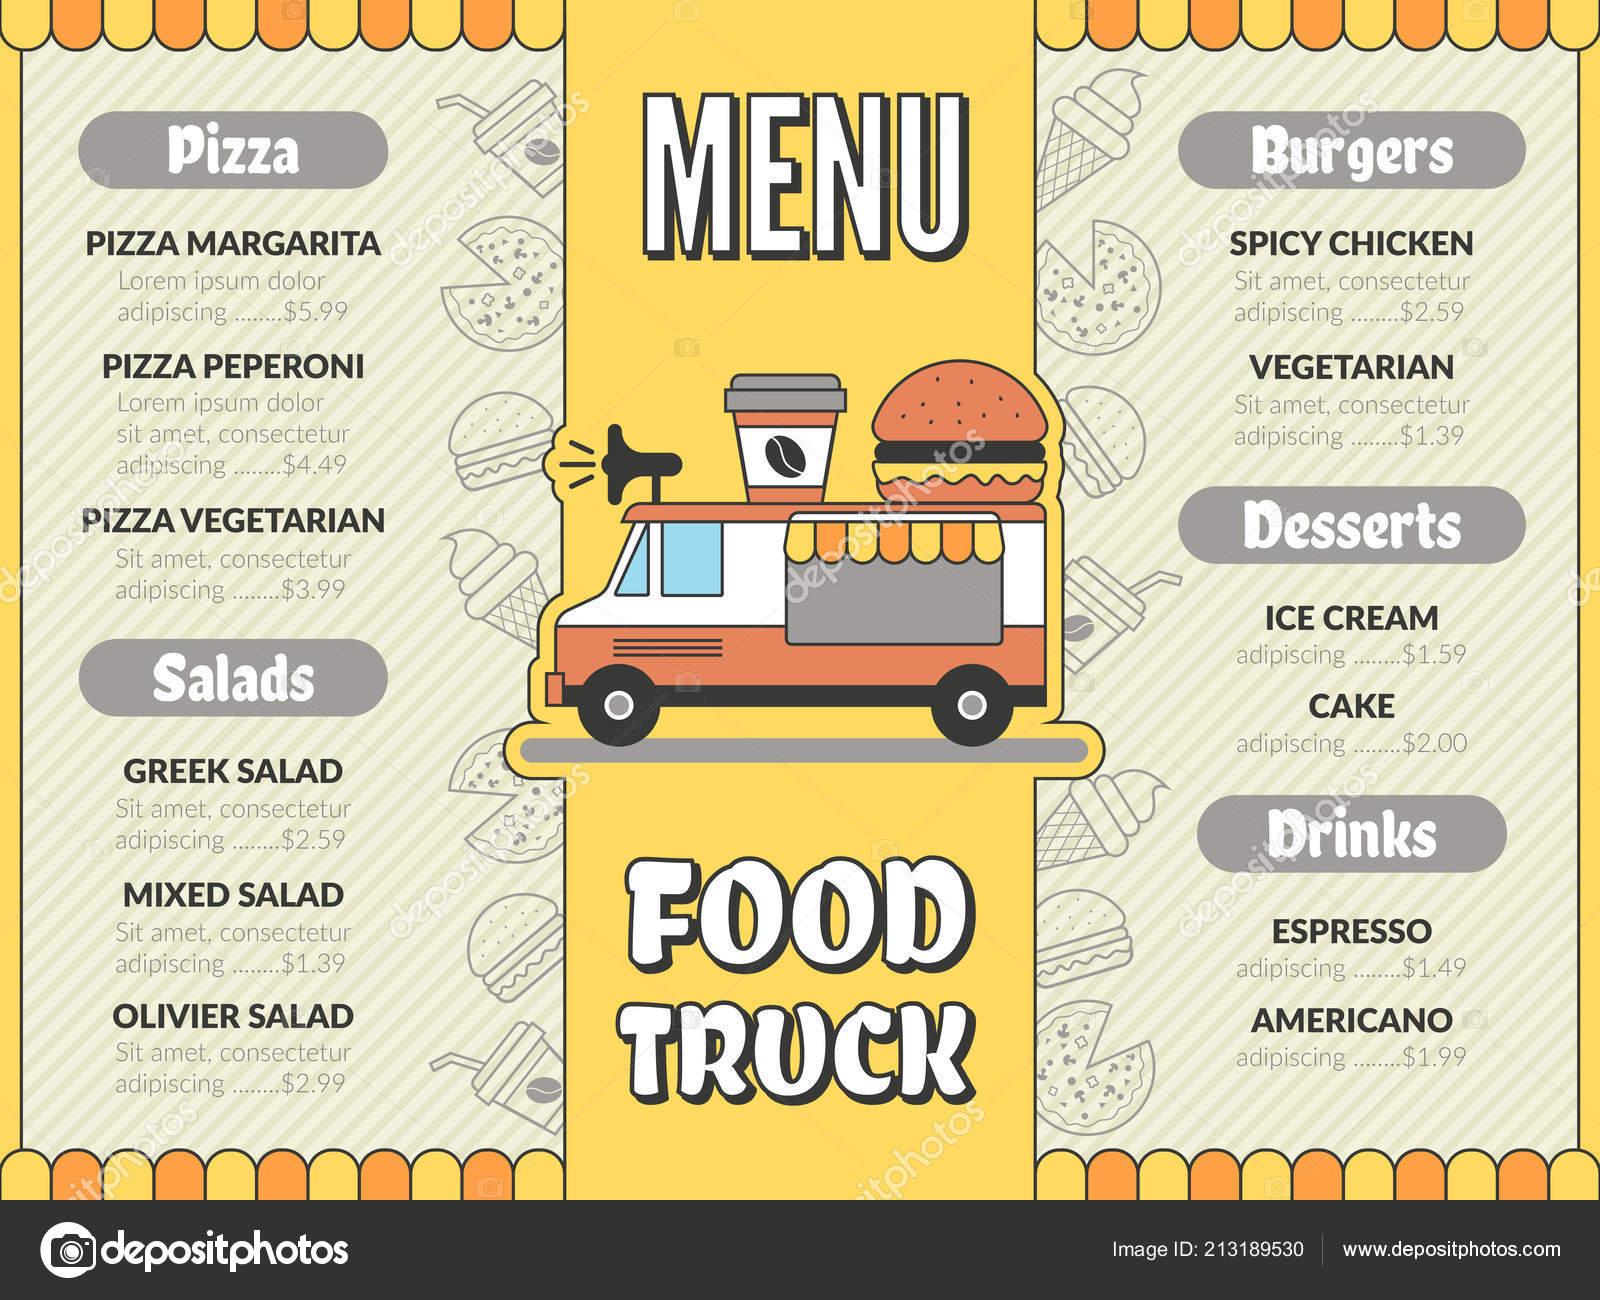 Mexican Outdoor Kitchen Designs Food Truck Menu Outdoor